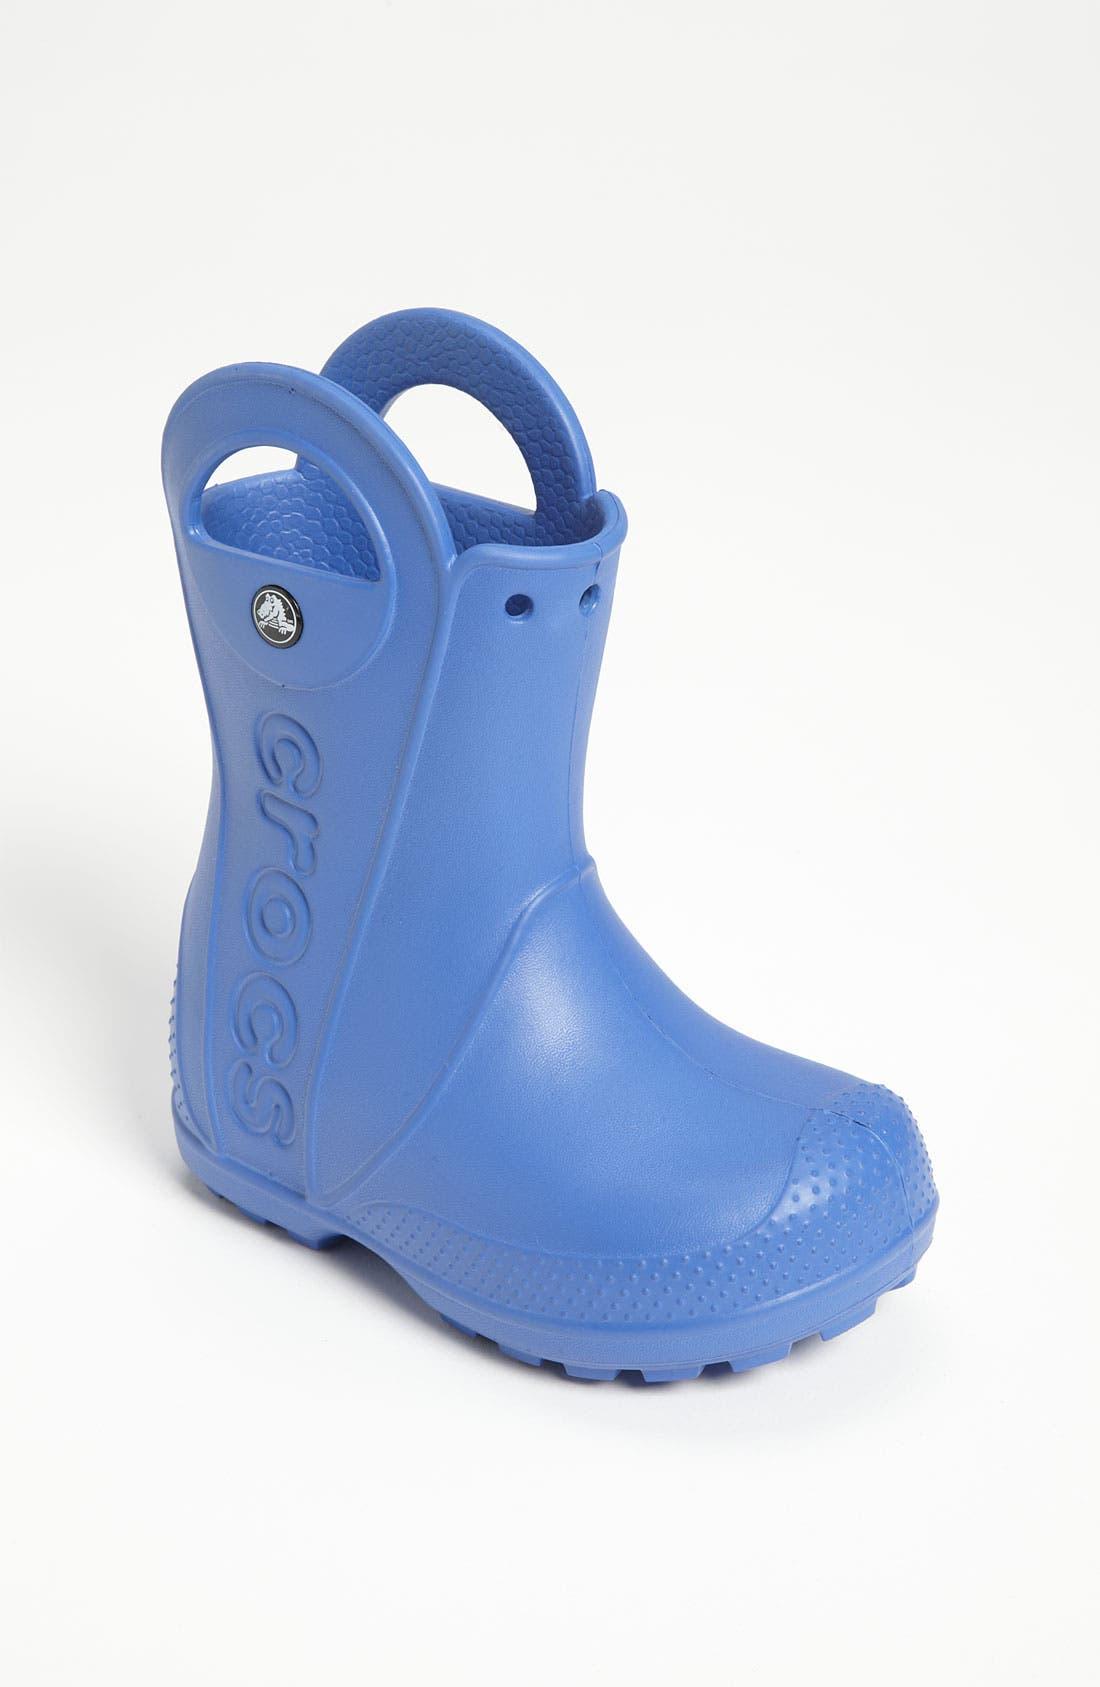 Alternate Image 1 Selected - CROCS™ 'Handle It' Rain Boot (Walker, Toddler & Little Kid)